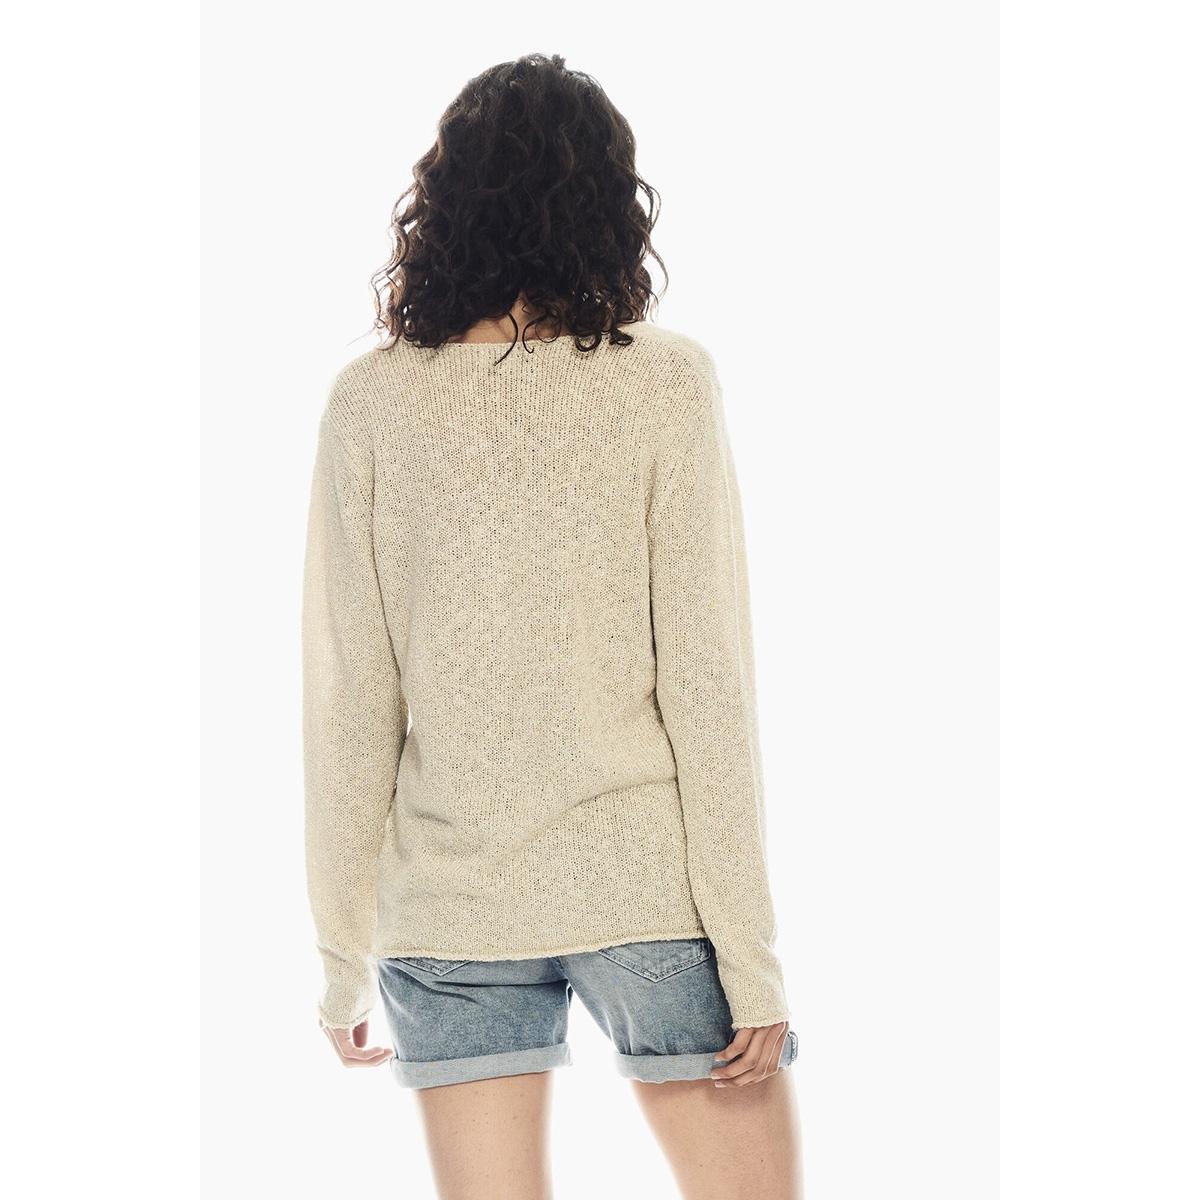 pullover p00241 garcia trui 8832 sandshell